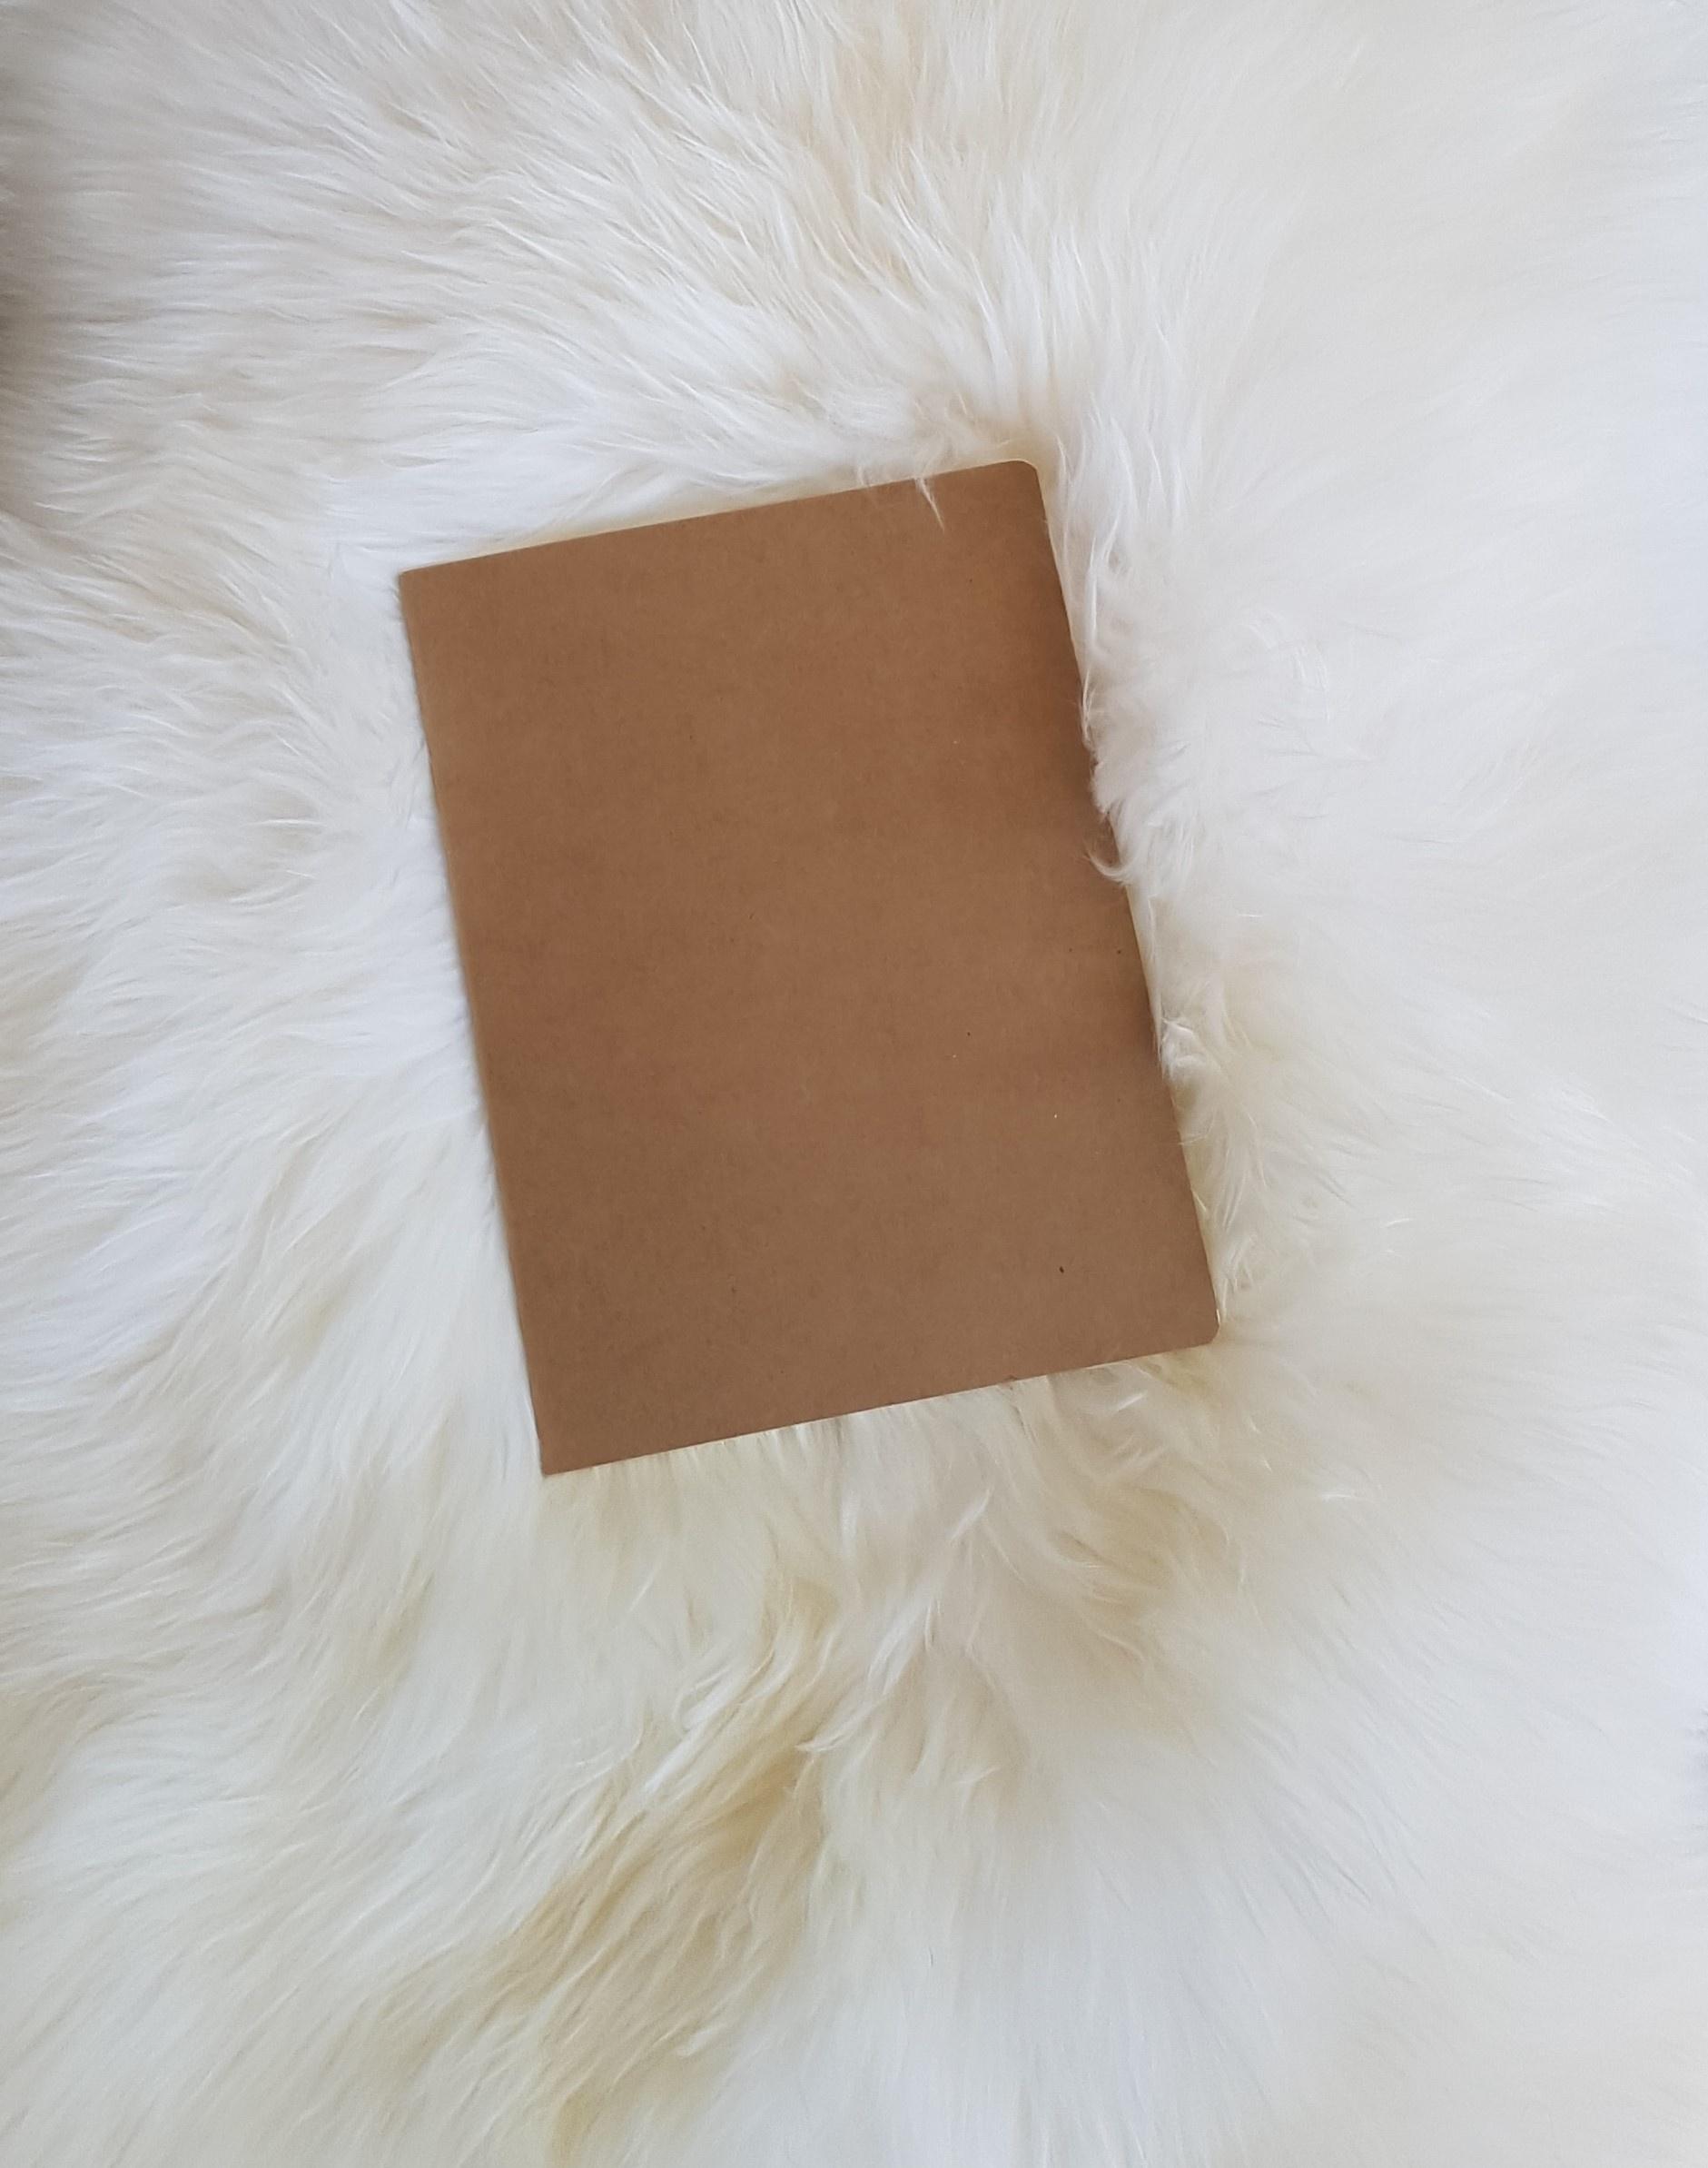 Frank A4 Soft Cover Notebook - Kraft